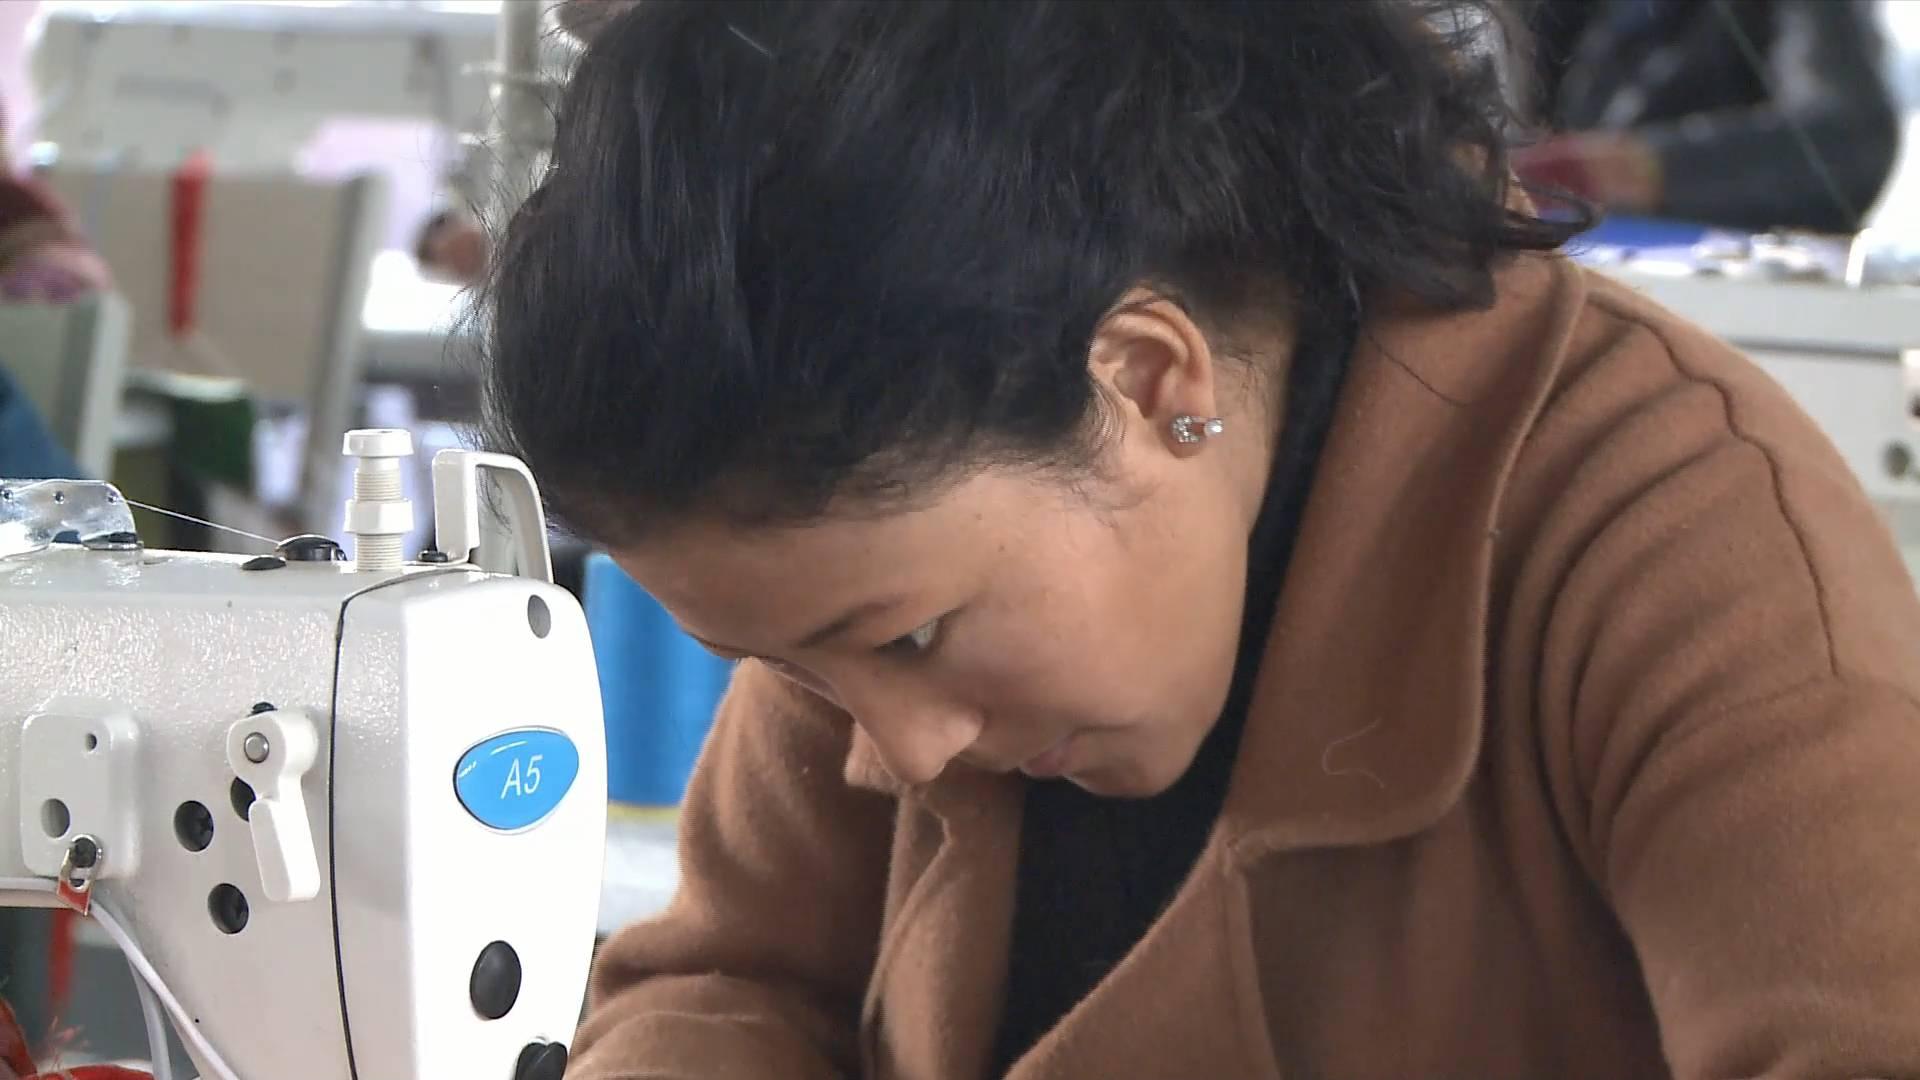 Tibet helps more than 600,000 farmers, herdsmen find jobs